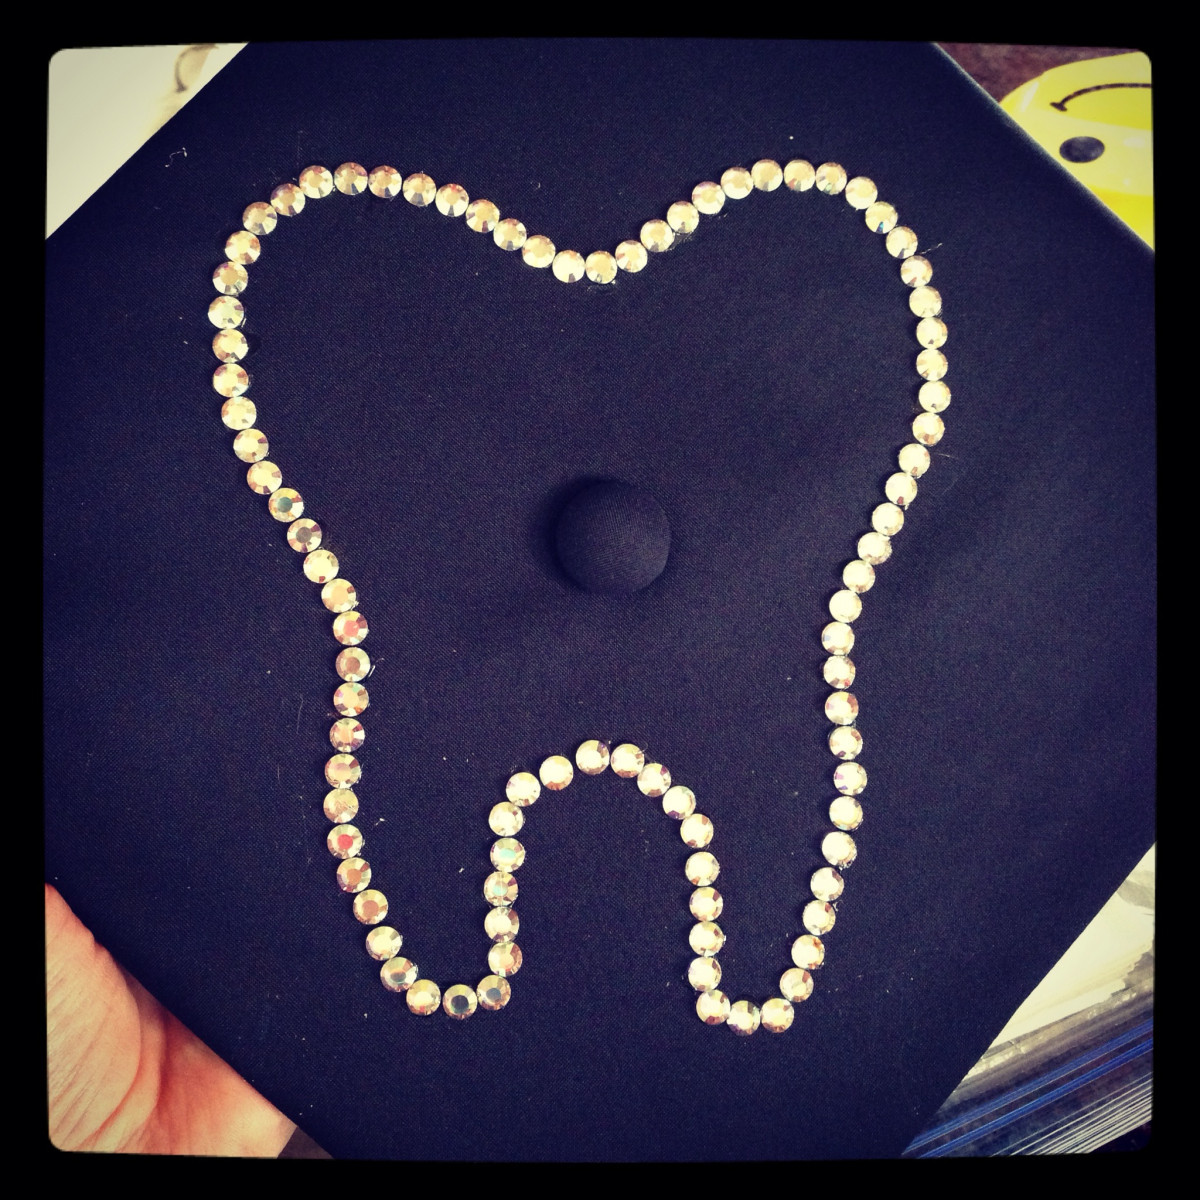 Dental School Graduation Gift Ideas For Her  Top 25 Dental Hygienist Graduation Gift Ideas Best Gift